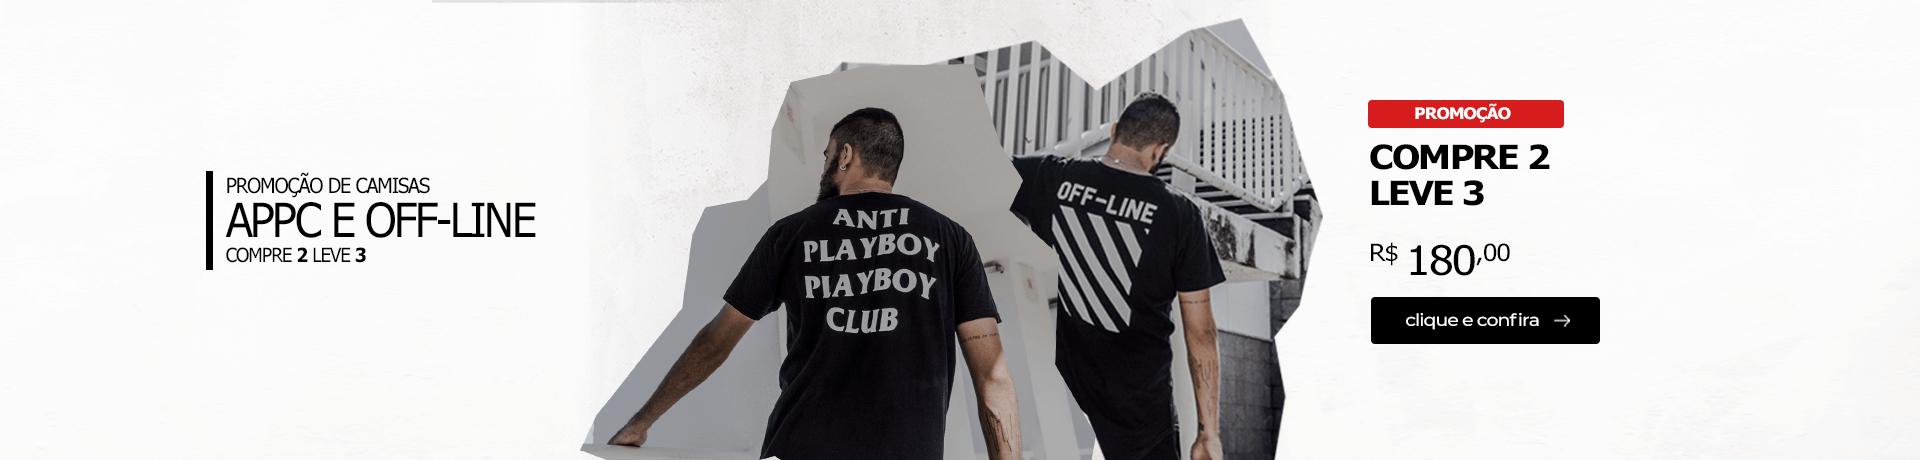 Promoção BM streetwear